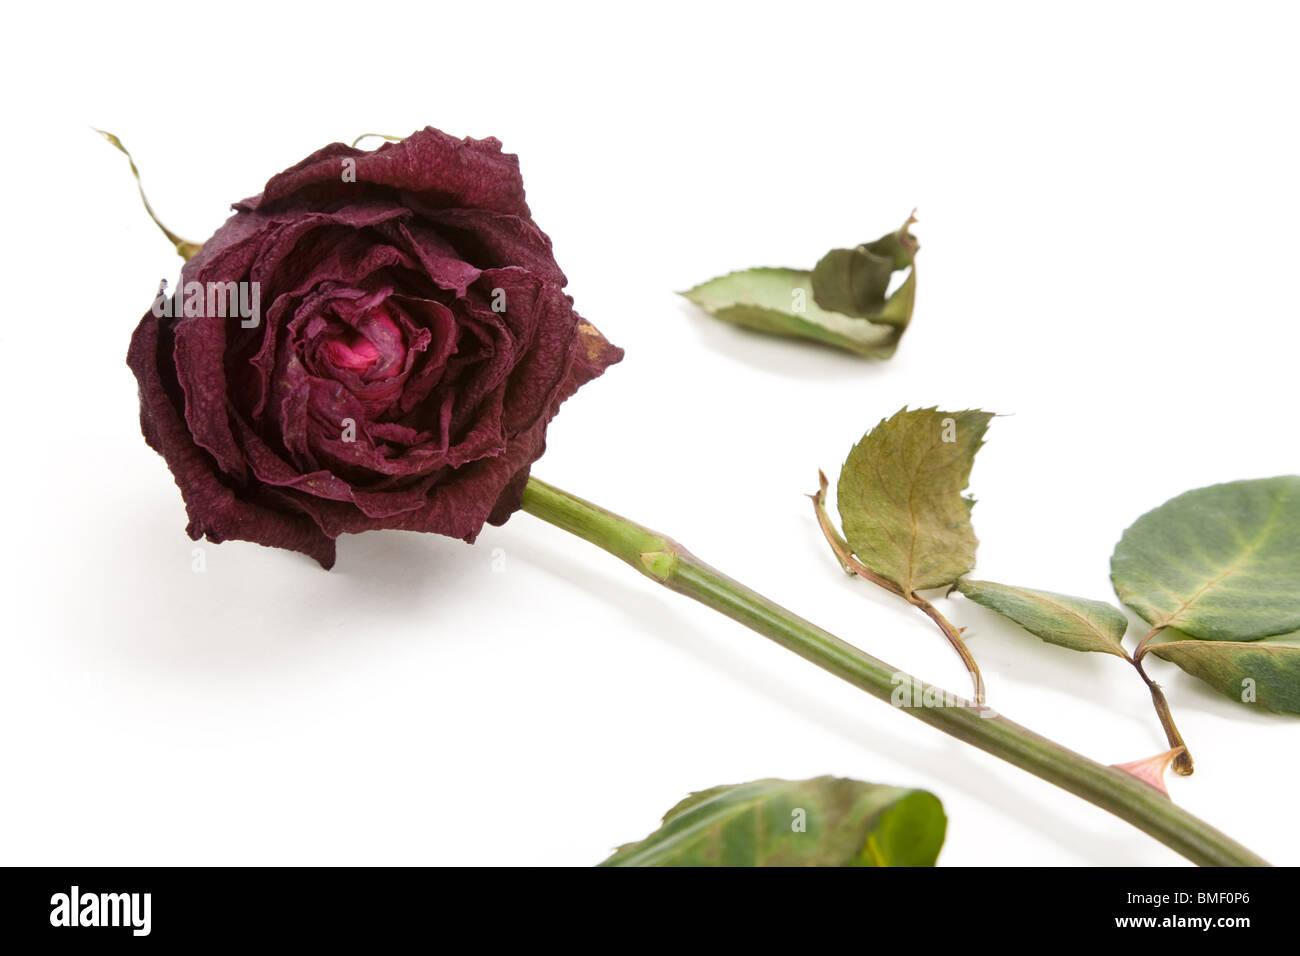 Red dead rose, concepto de amor perdido Foto de stock